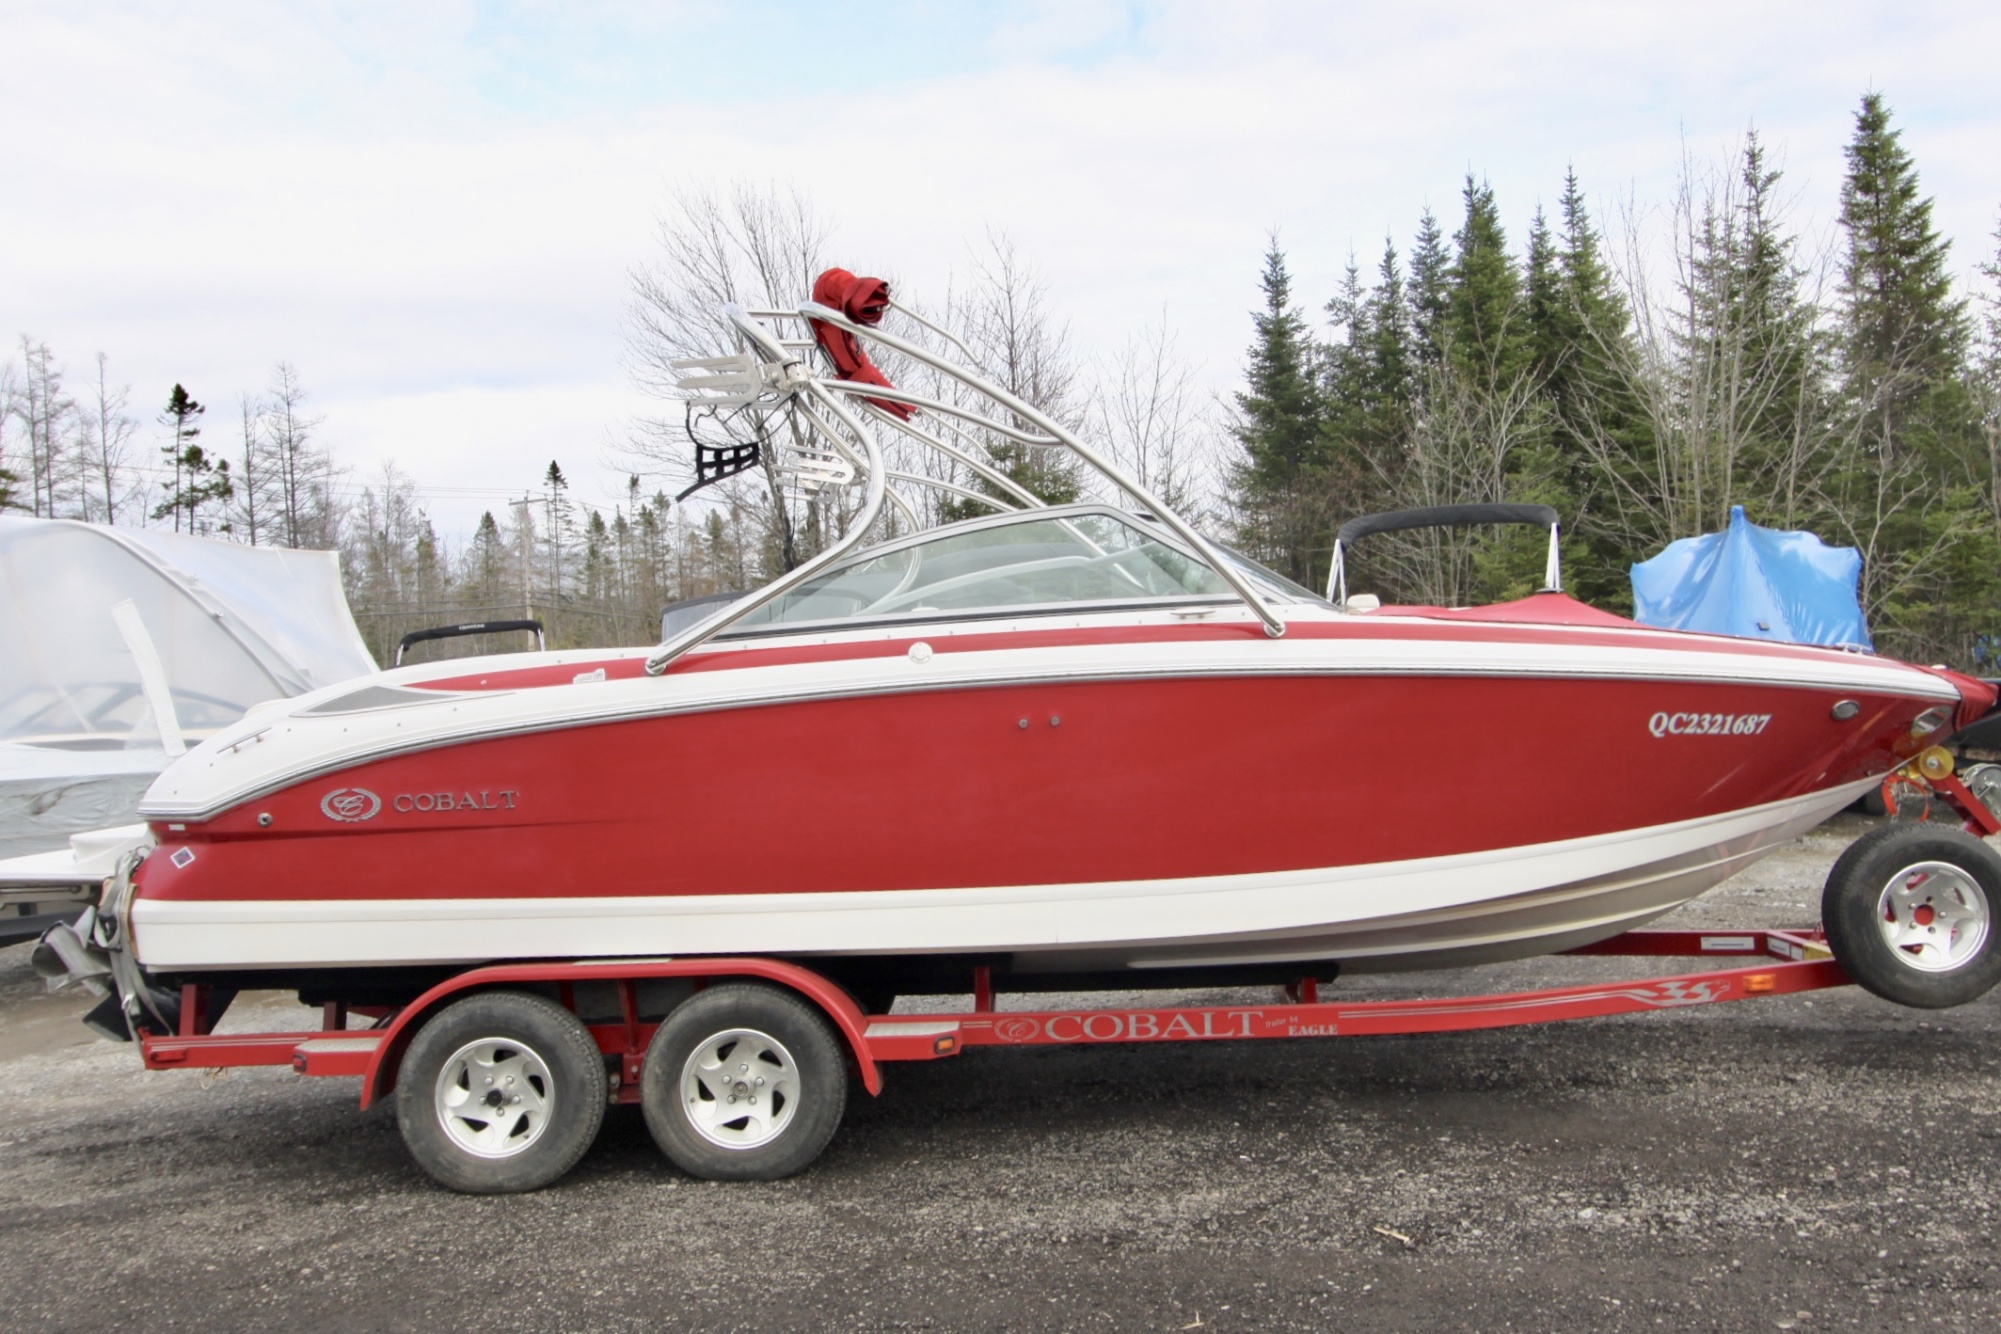 Cobalt Boats 222 - ED1634C4-C9FC-4A2B-9B68-04A3A7B58D57.jpeg